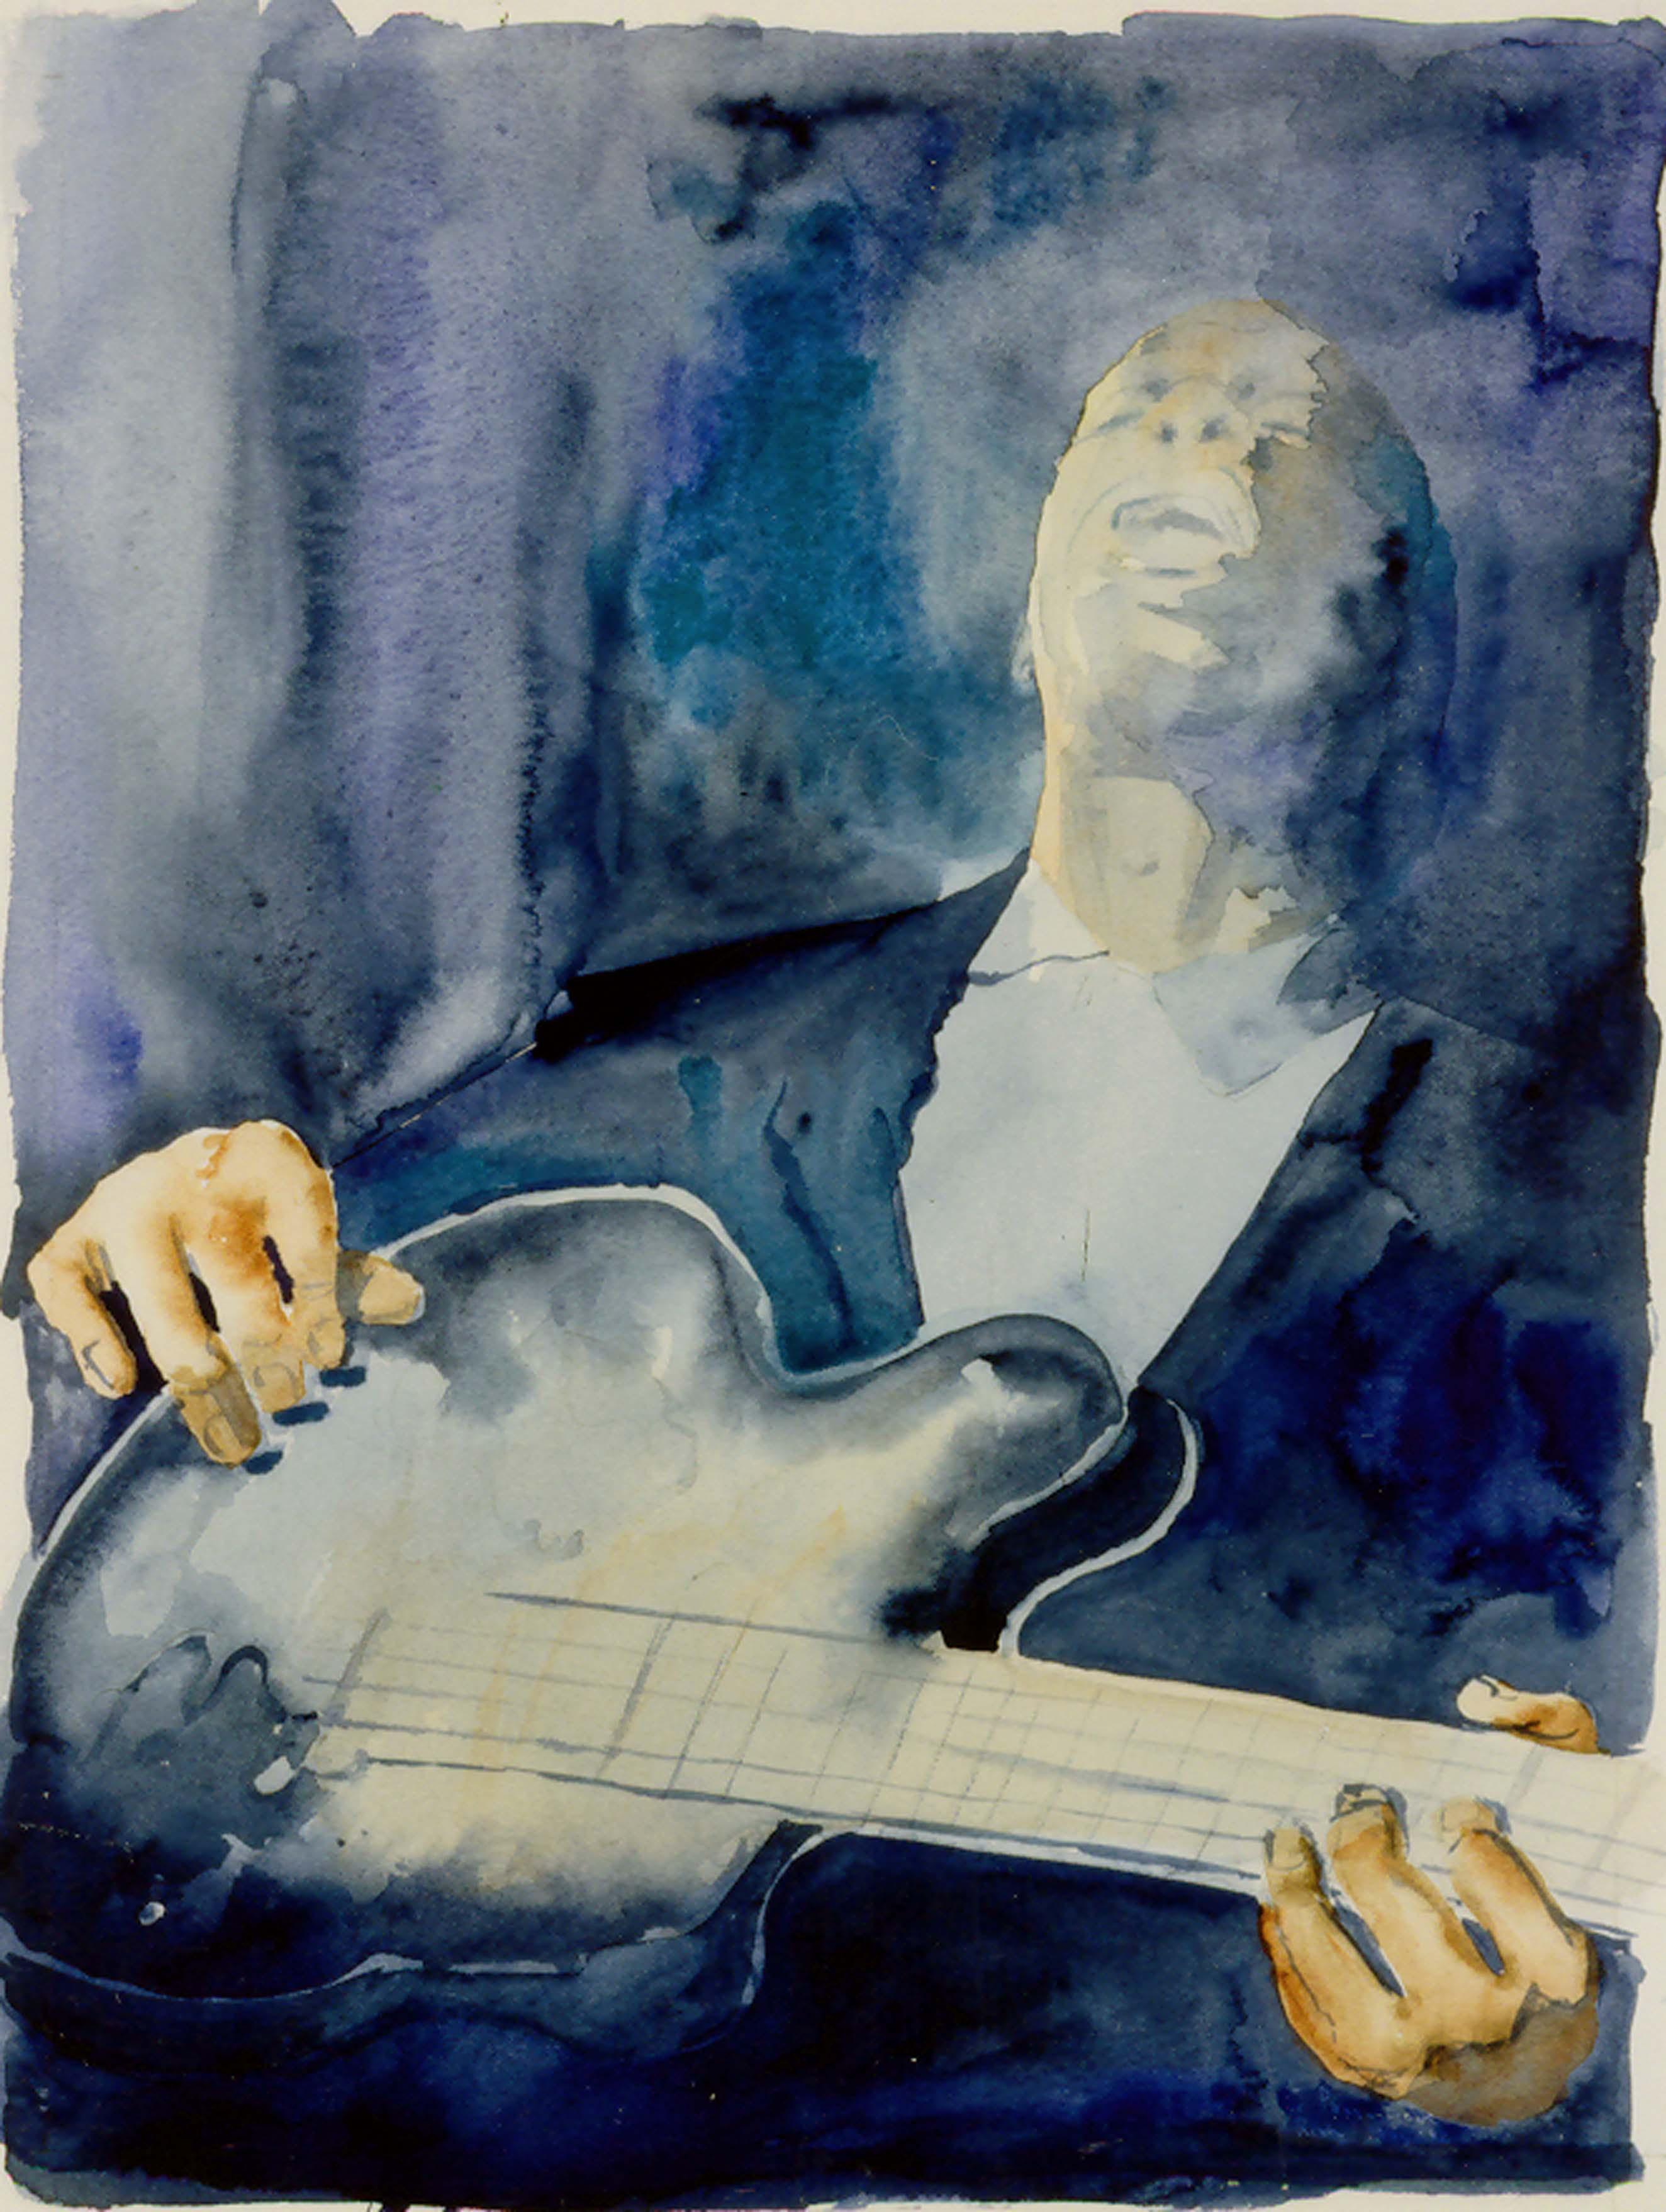 Grant Green's Blues